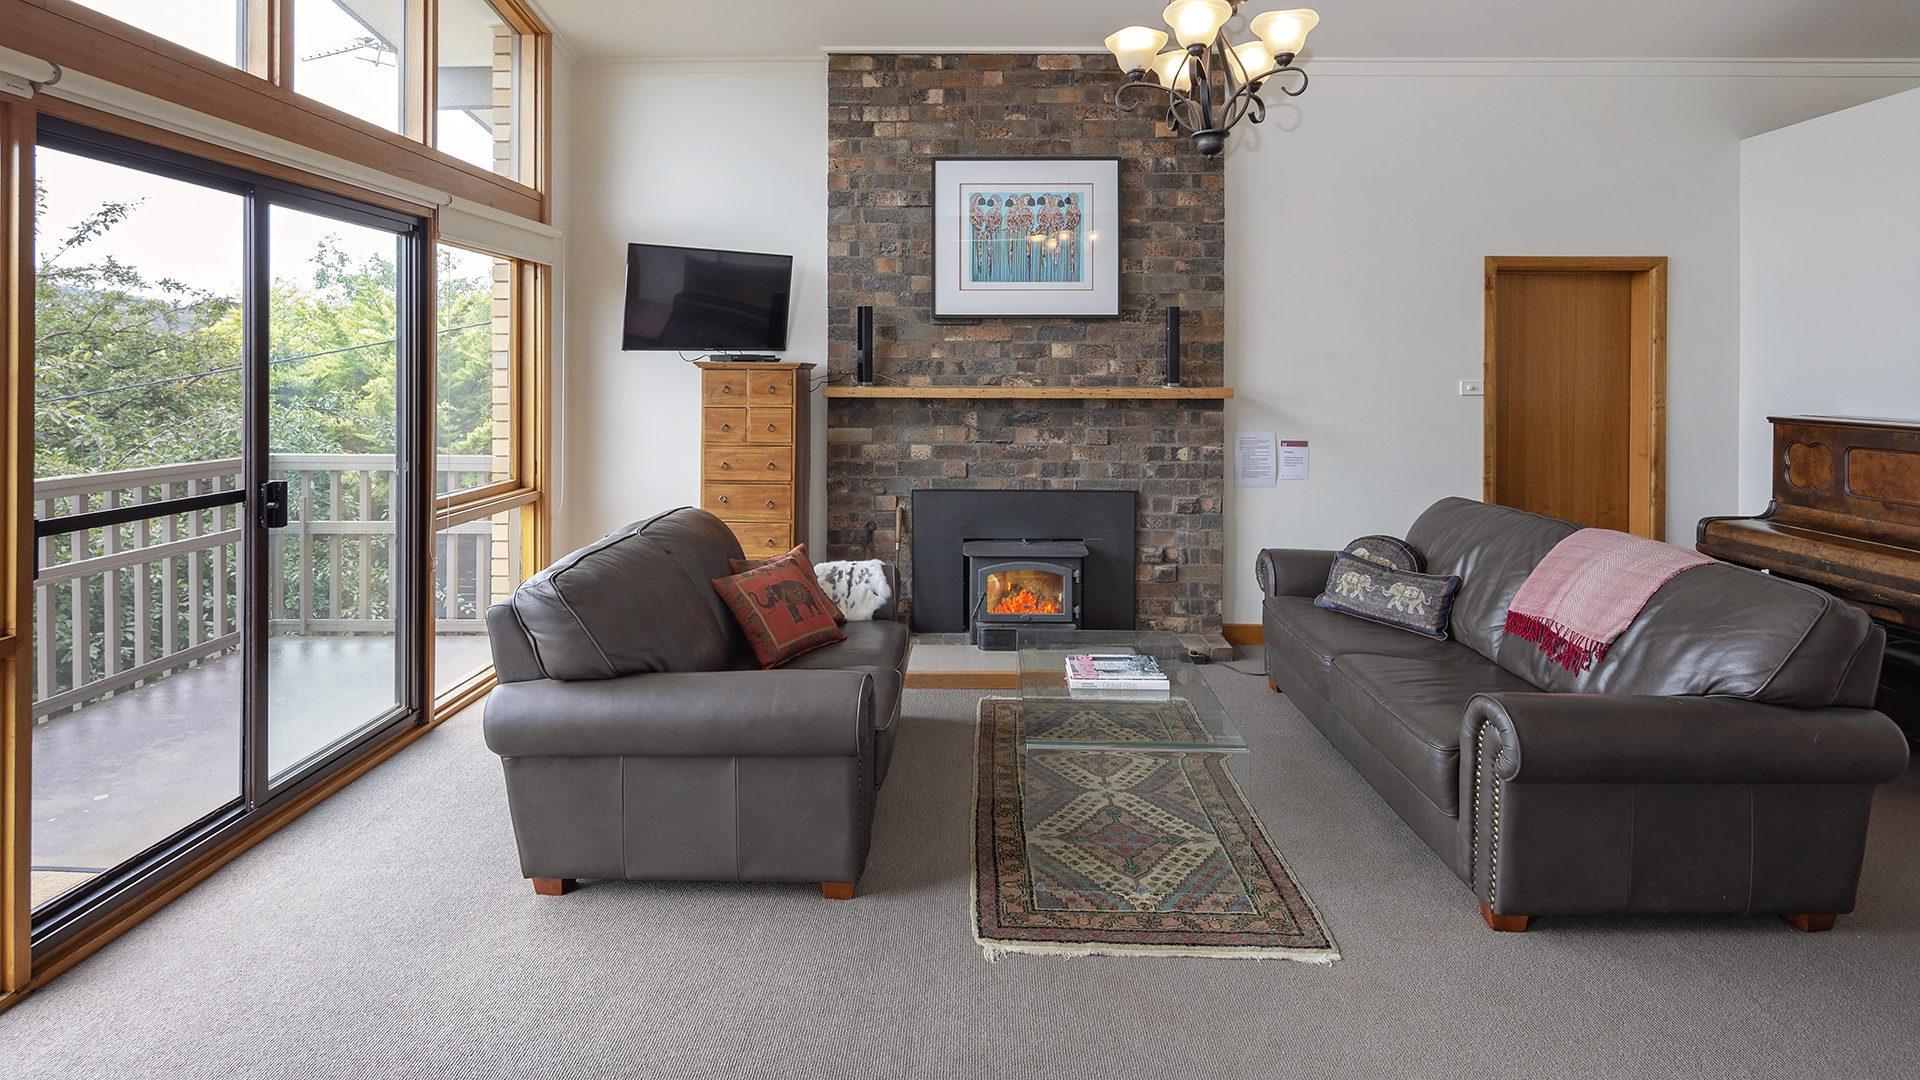 Alpine House, Jindabyne - 3 BD/1BA/6 Guests